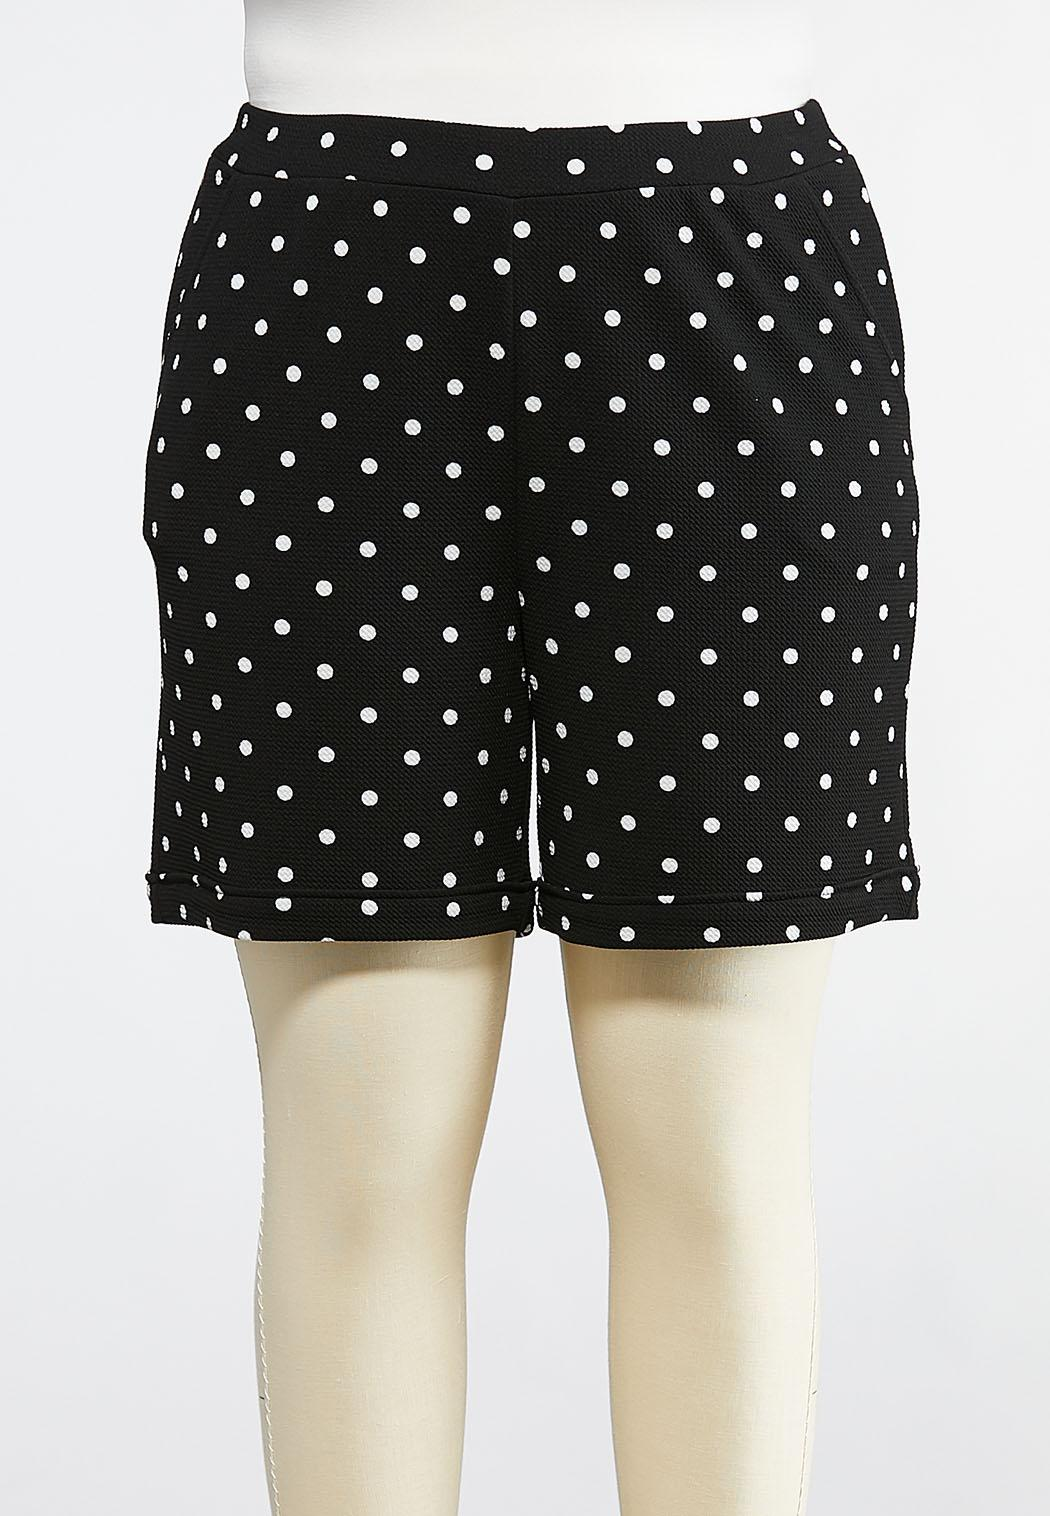 Plus Size Pull-On Polka Dot Shorts